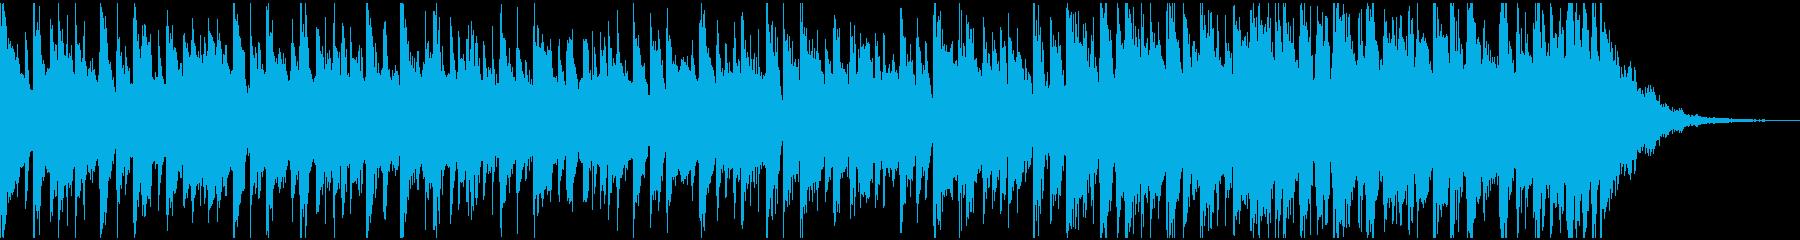 High tech electro...'s reproduced waveform